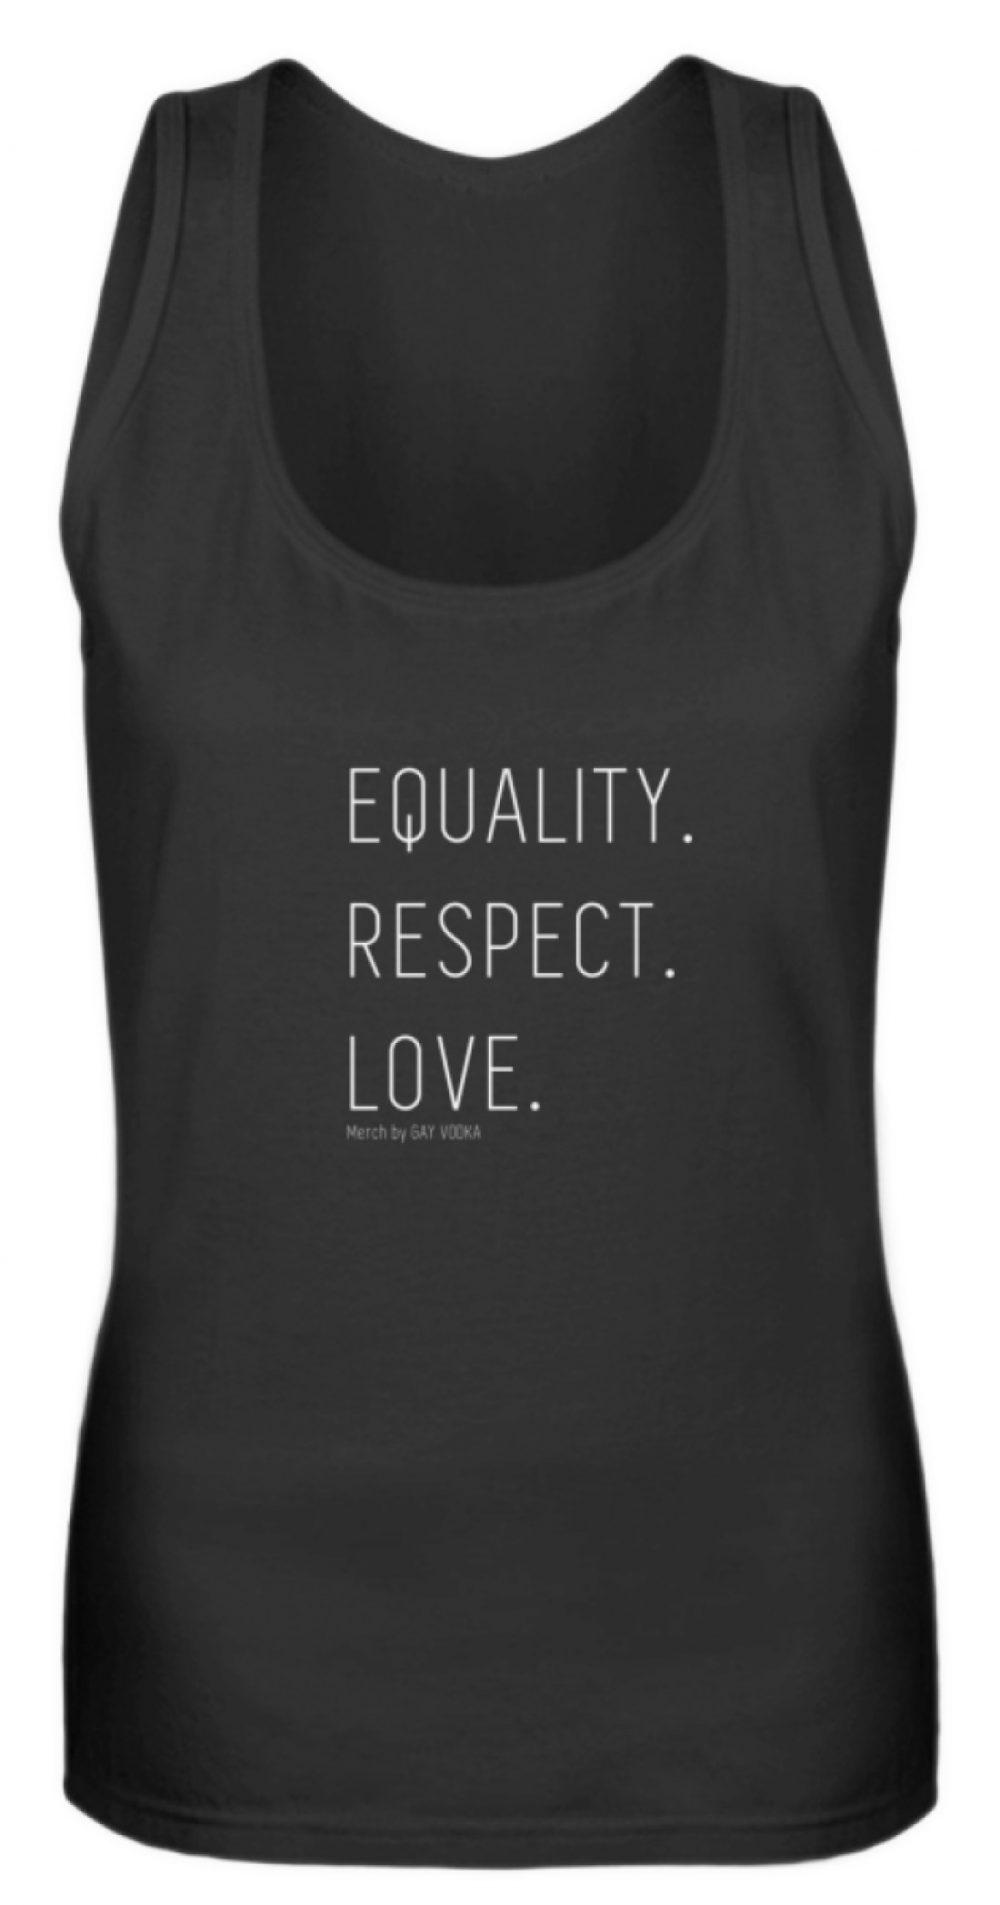 EQUALITY. RESPECT. LOVE. - Frauen Tanktop-16